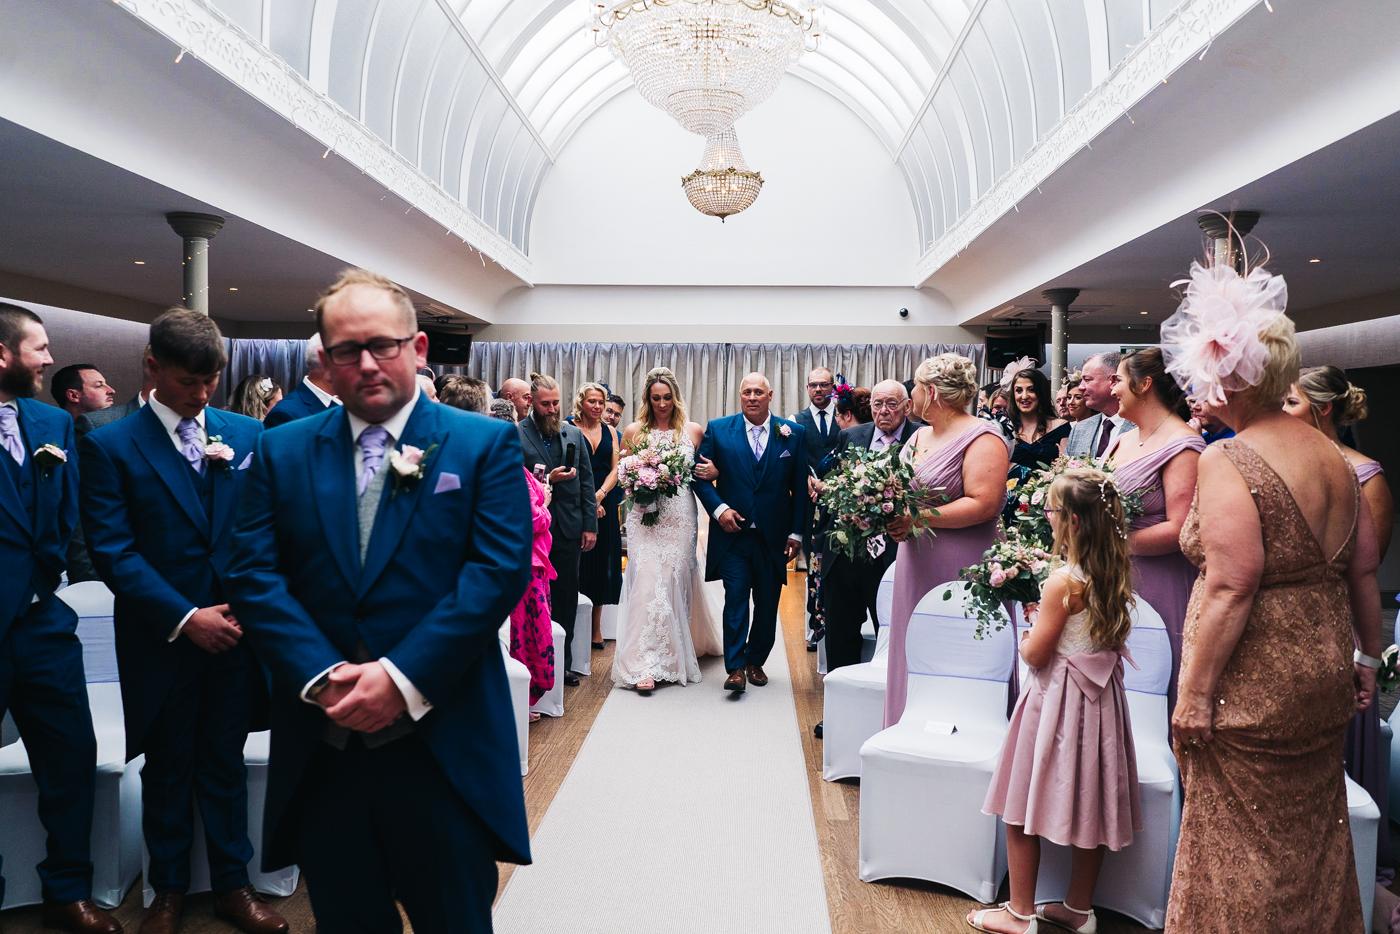 headlame-hall-north-yorkshire-north-east-photographer-wedding-0020.jpg